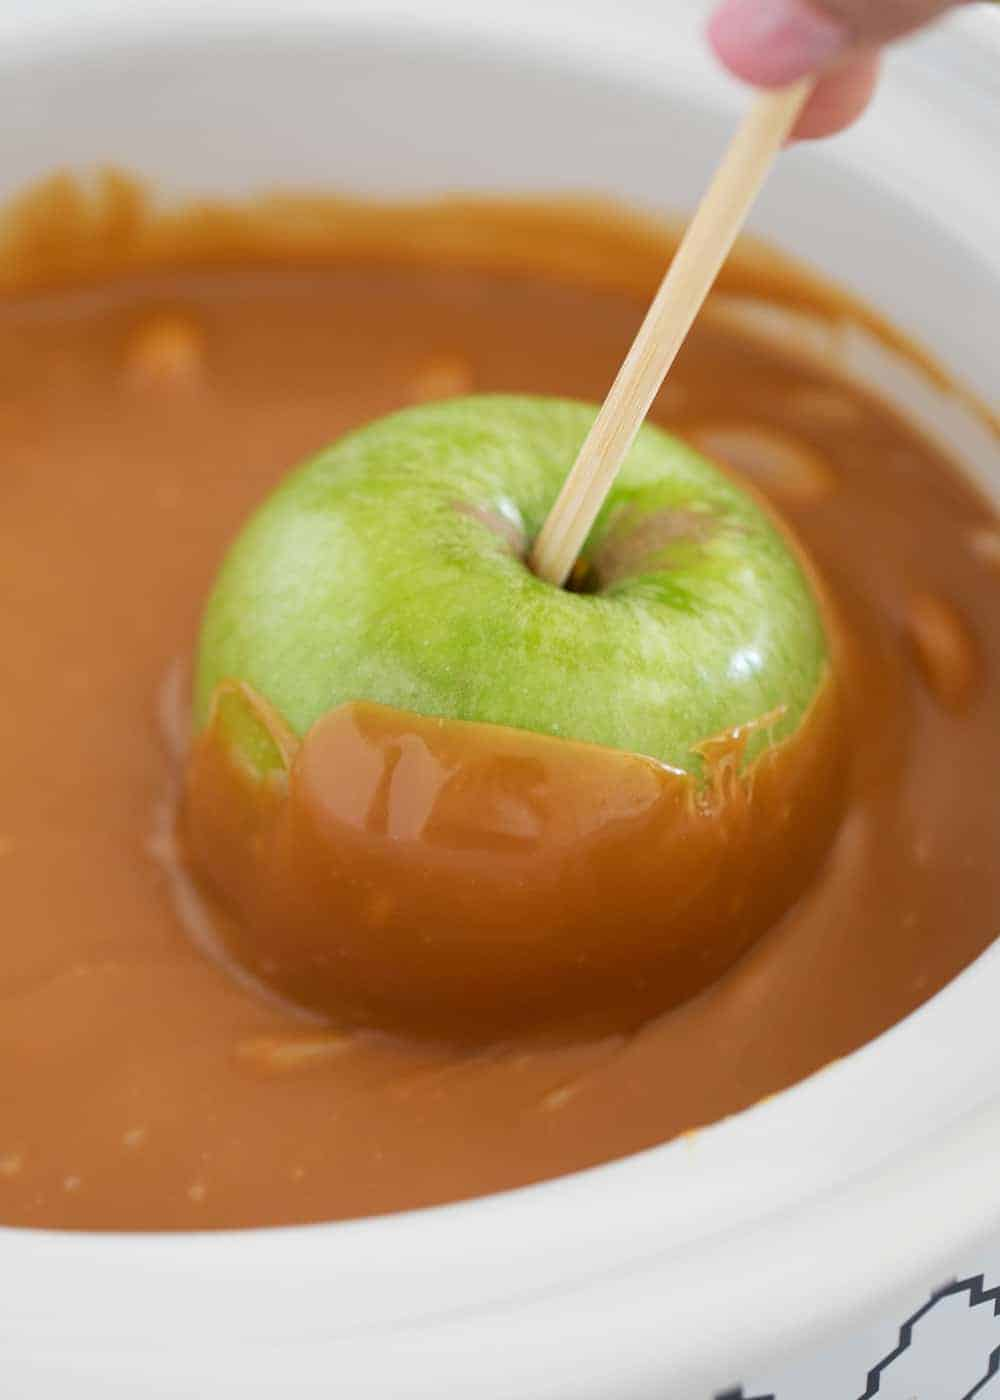 How To Make Homemade Caramel Apples I Heart Naptime